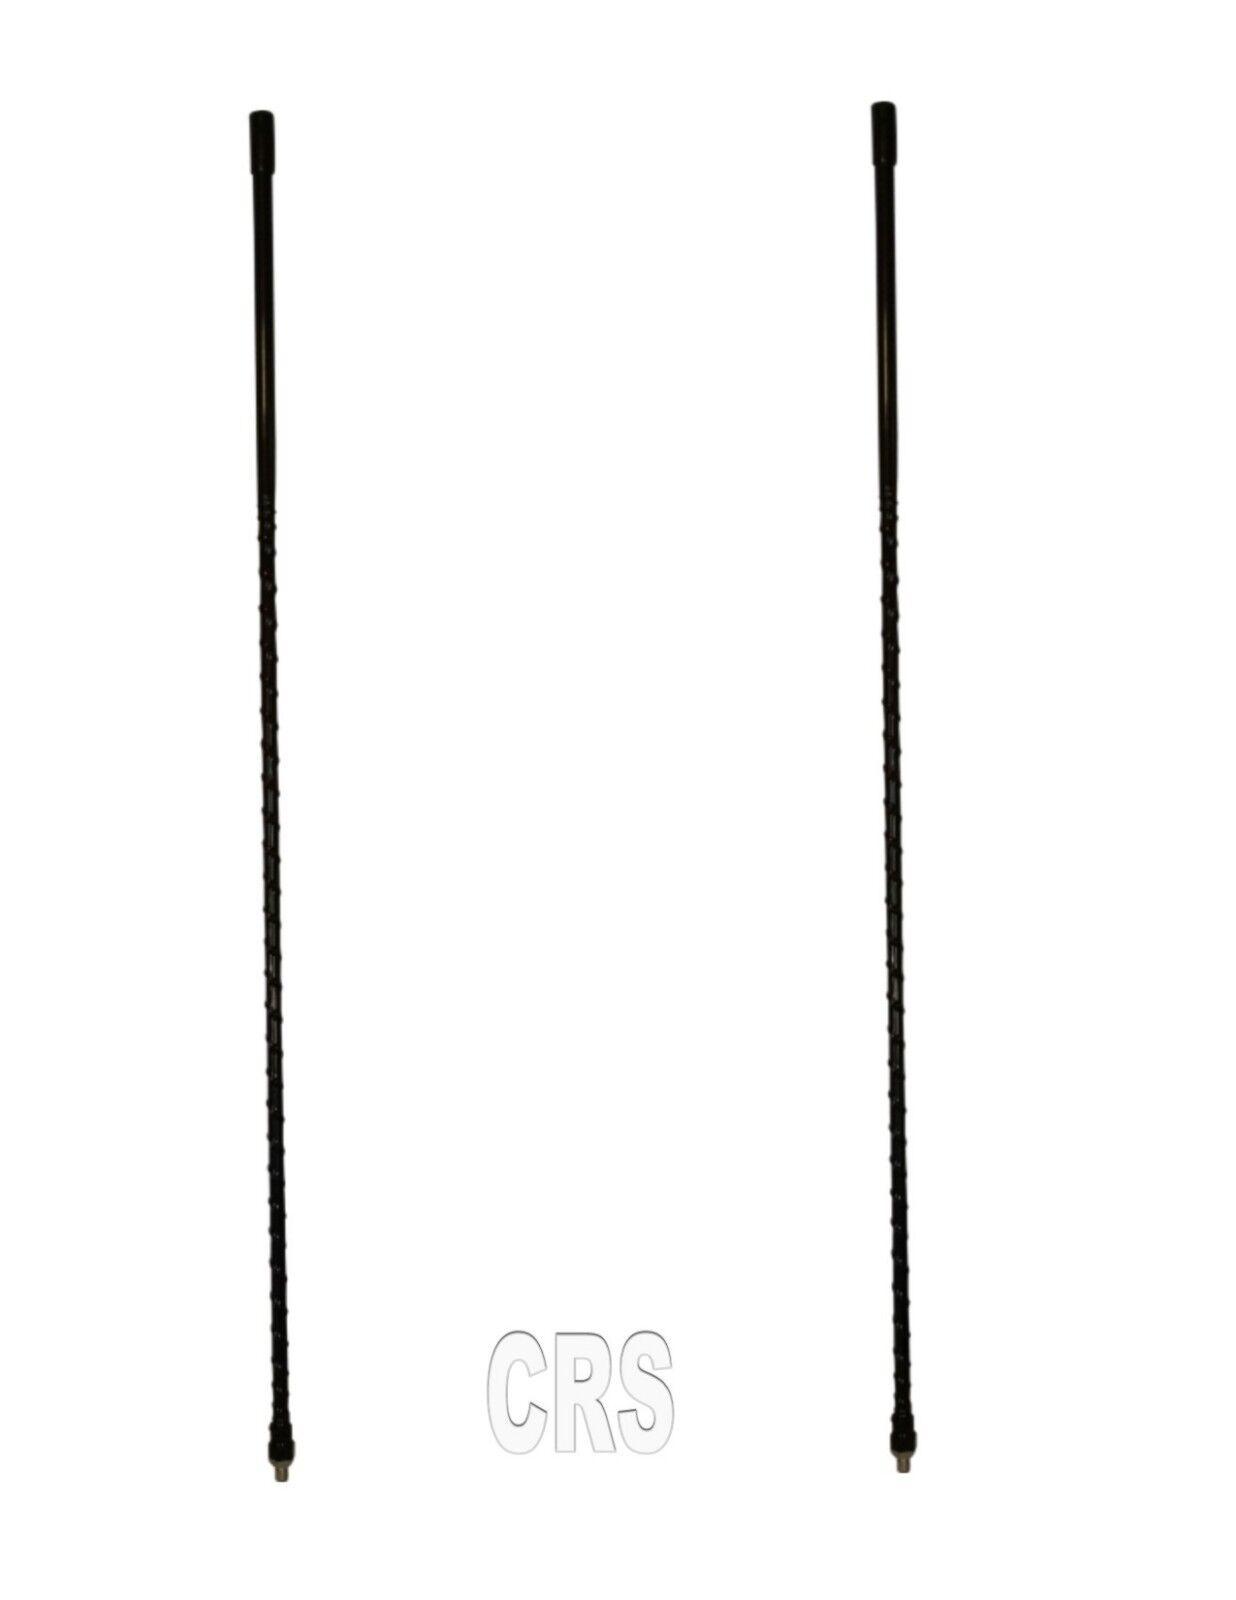 LOT OF 2 CB RADIO SUPPLY 4` Foot Fiberglass 500 Watt CB Radi